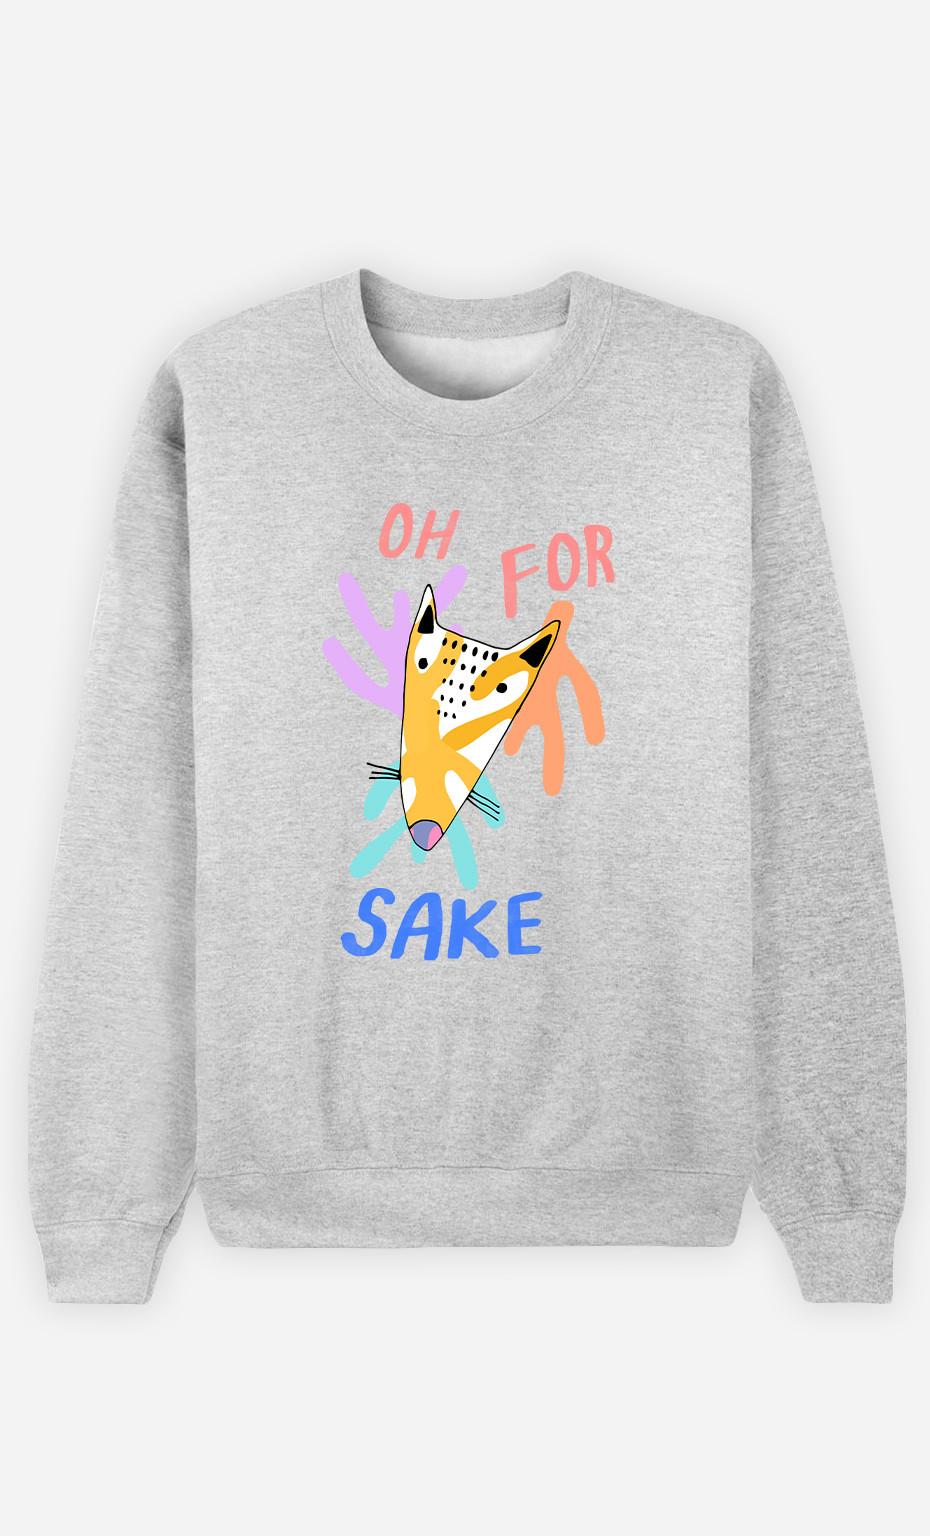 Woman Sweatshirt For Fox Sake